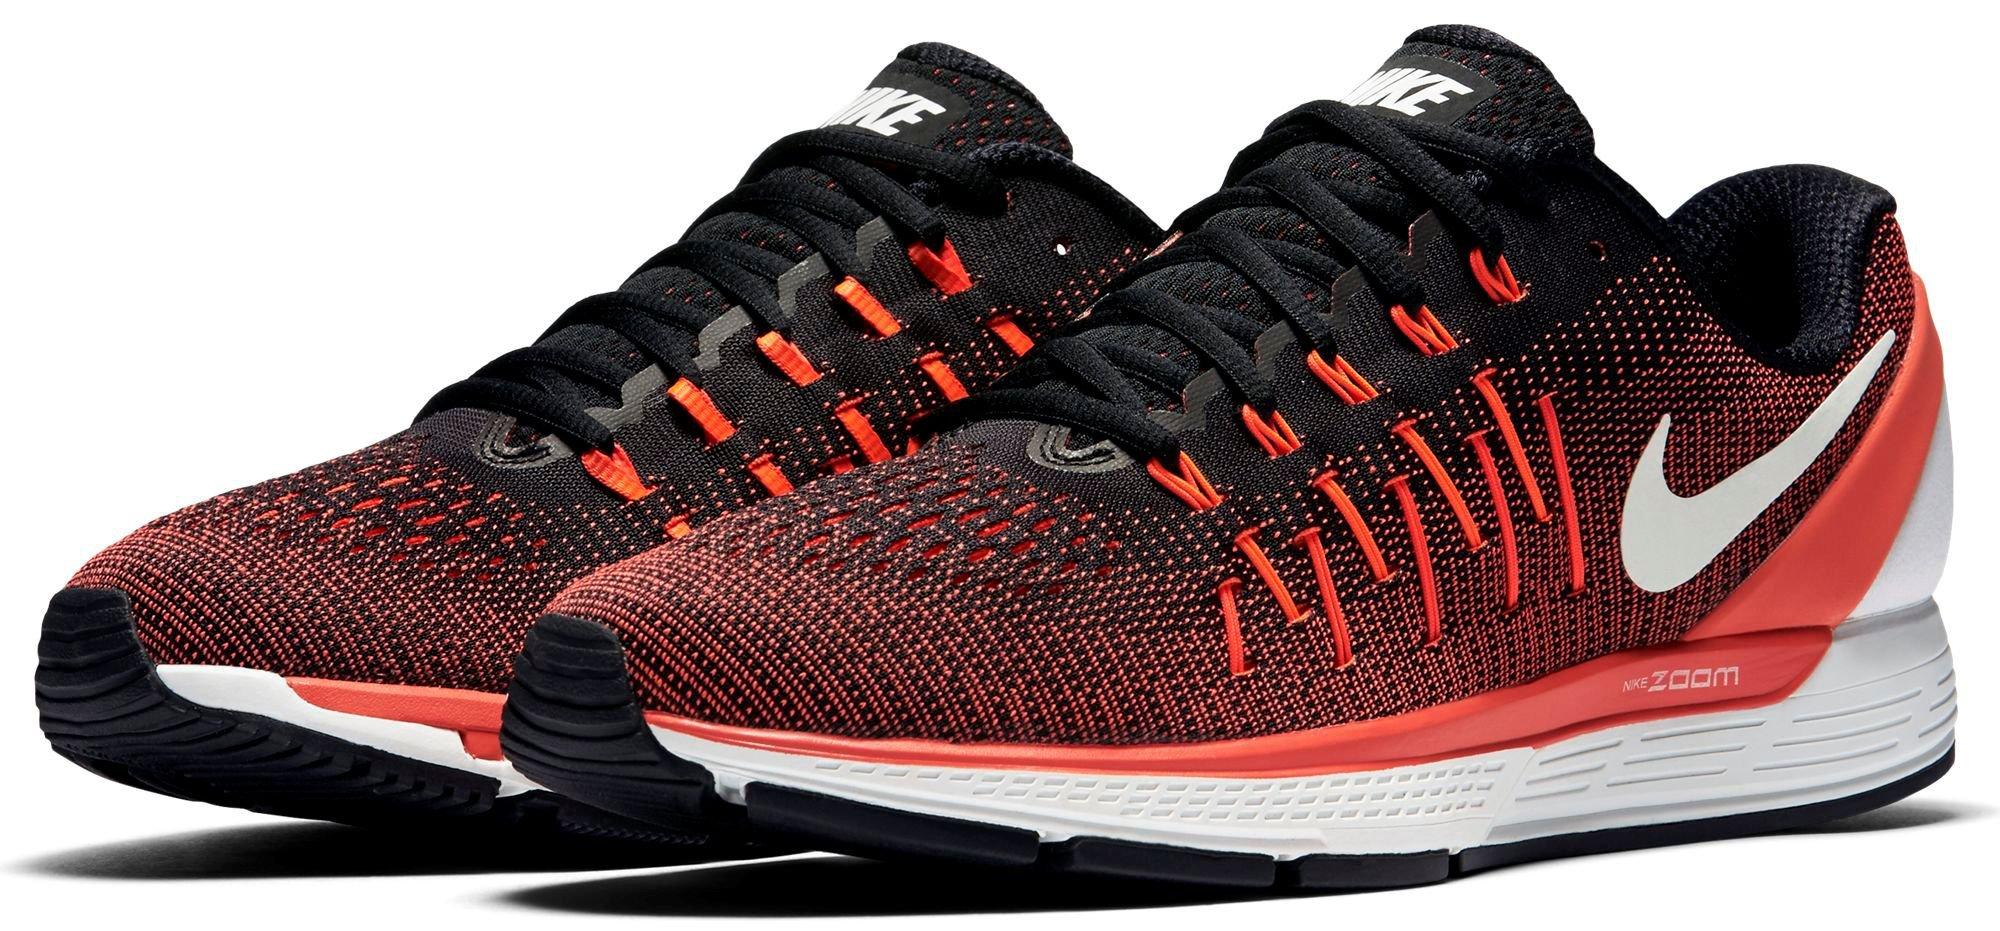 d5fd92f2 Купить кроссовки Nike Air Zoom Odyssey 2   Интернет-магазин RunLab